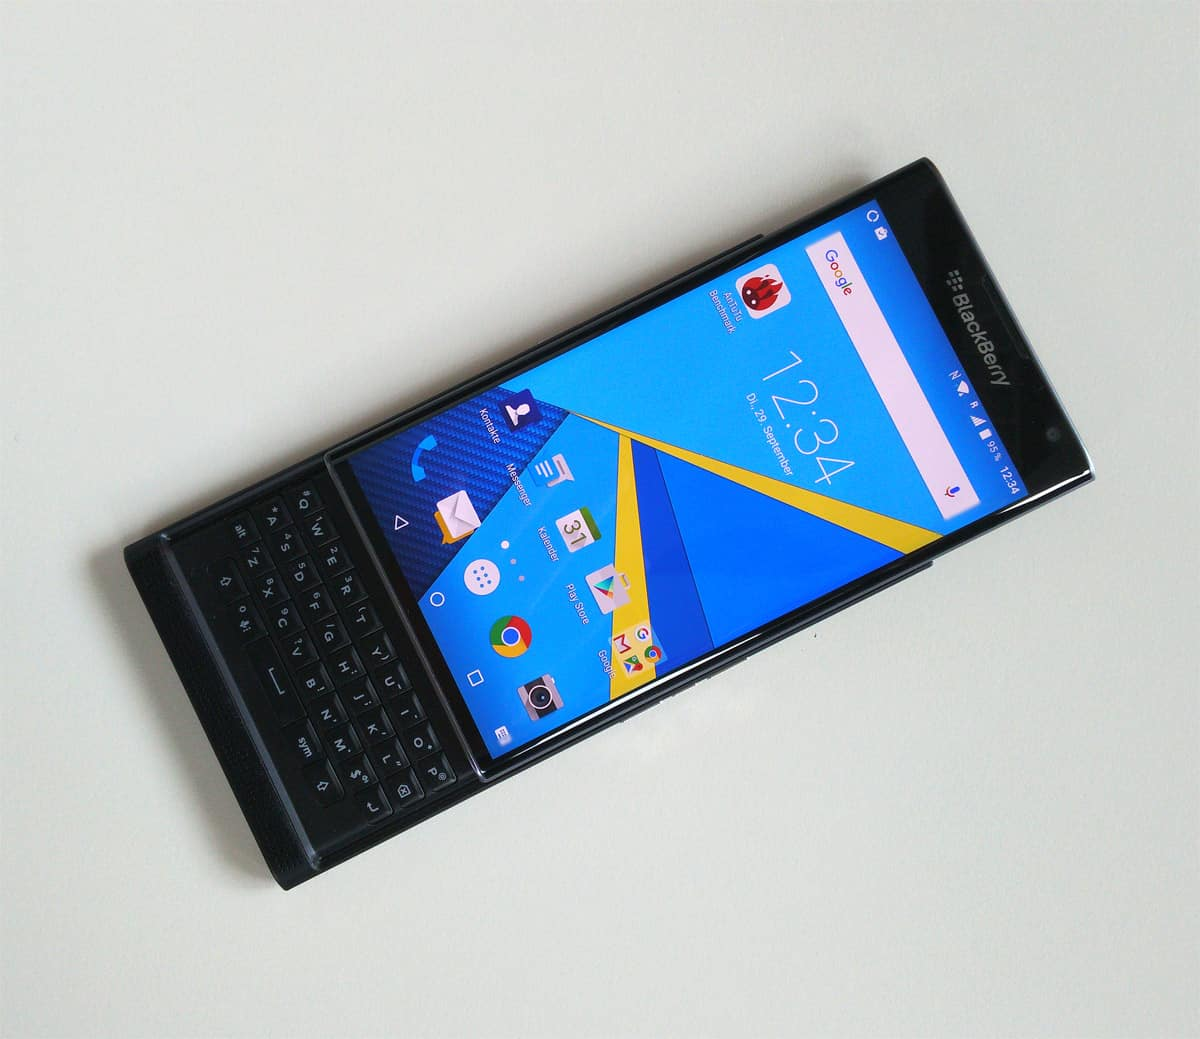 BlackBerry pre release hands on 1